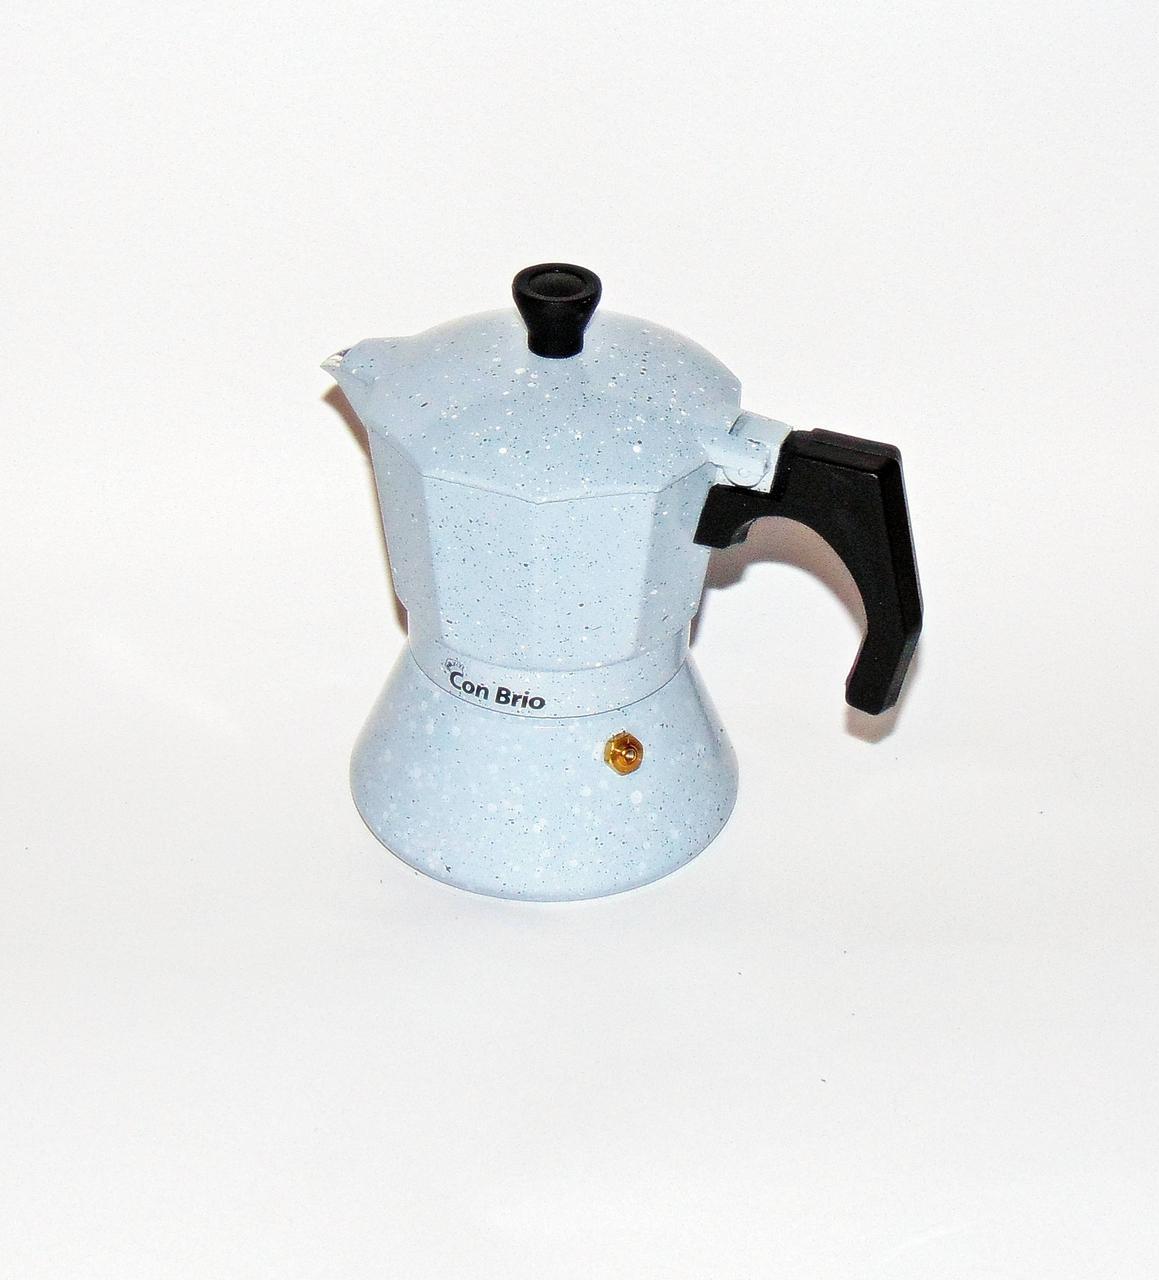 Кофеварка гейзерная алюминиевая  на 3 чашки индукция